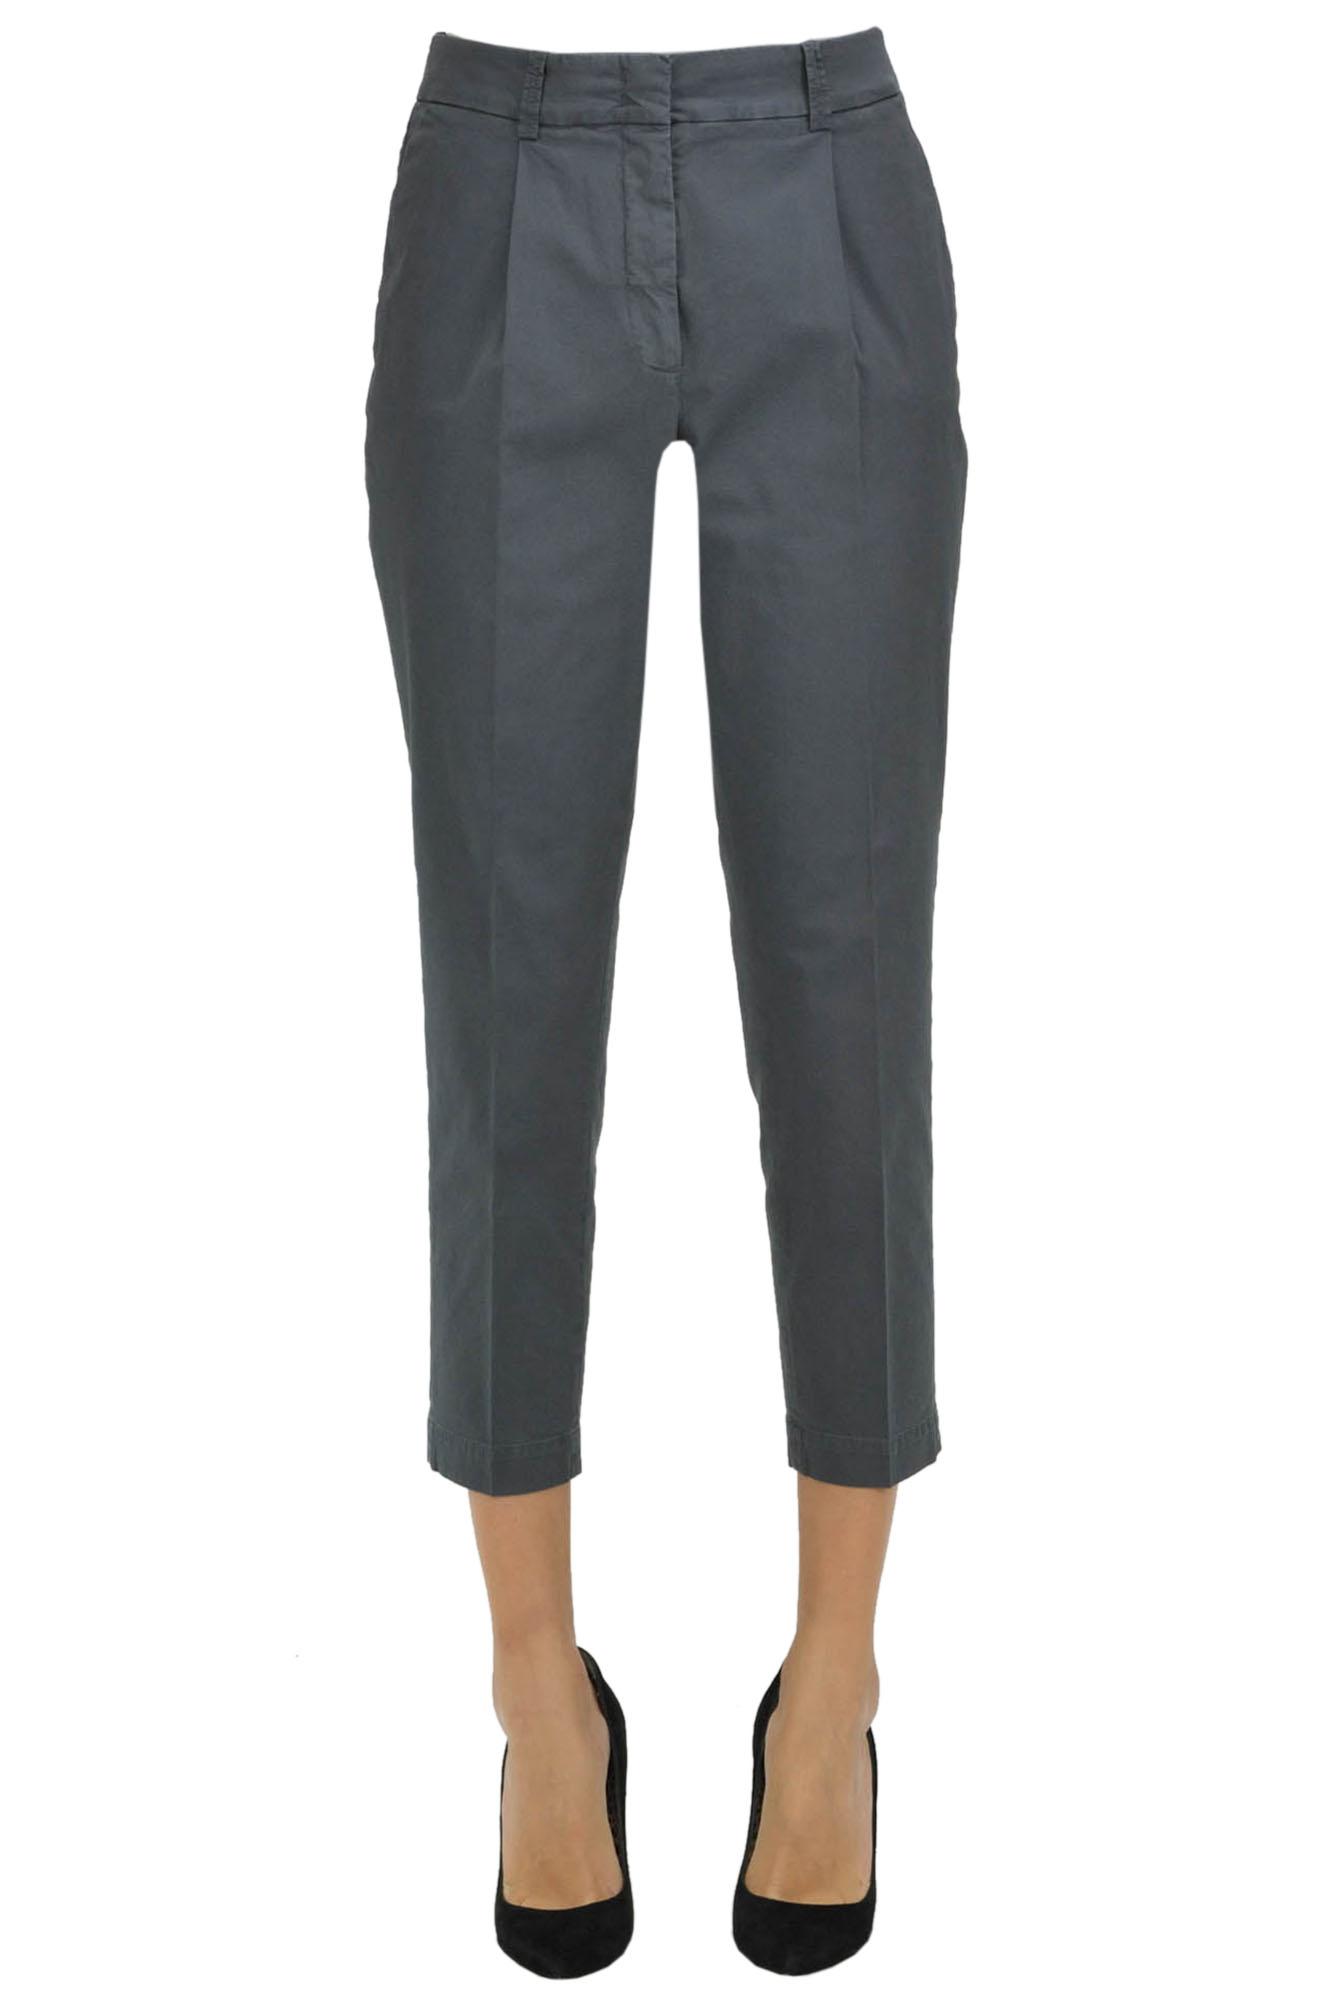 Image of Pantaloni Capri in cotone